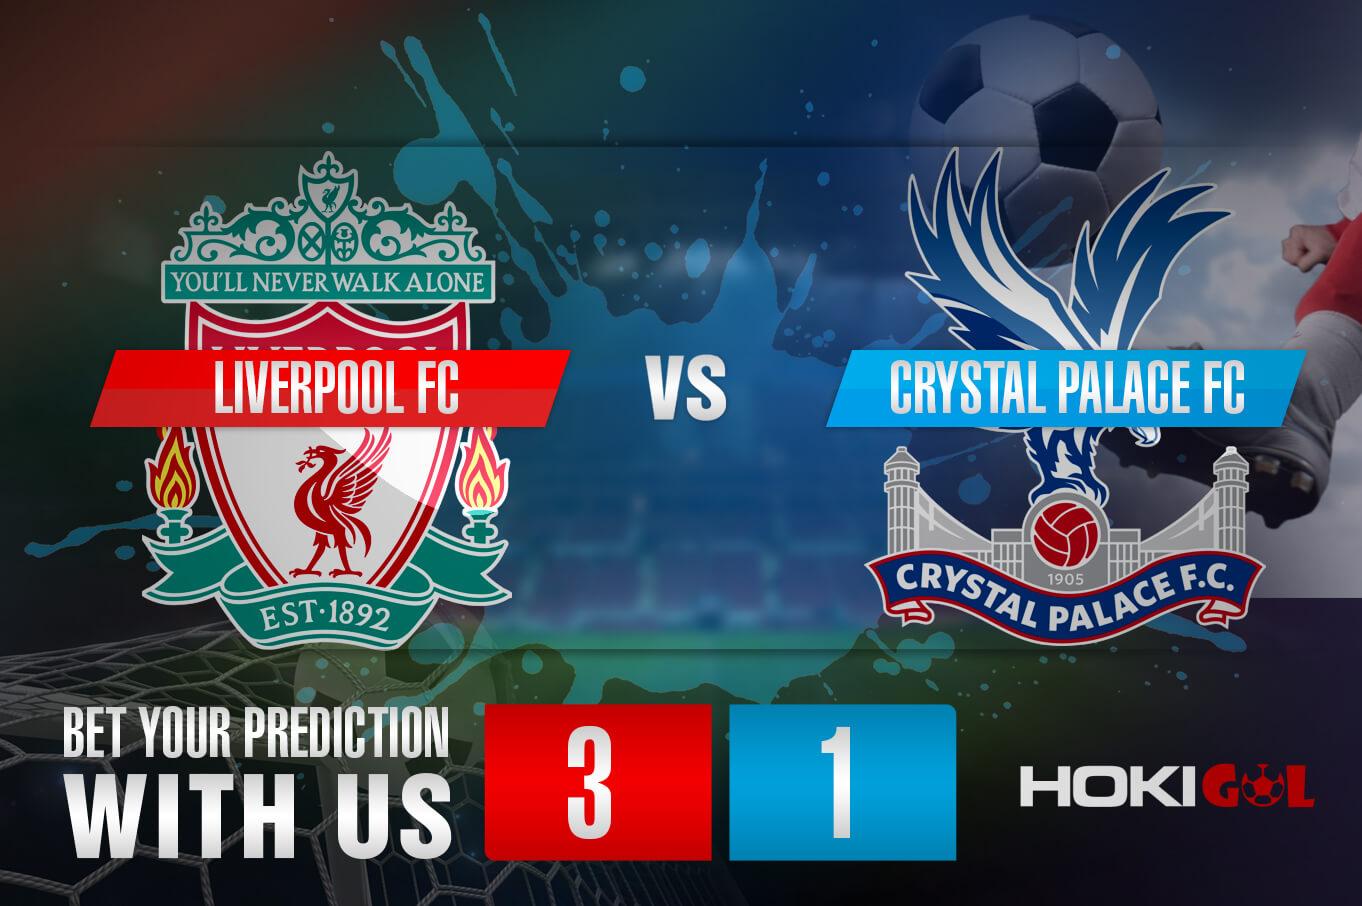 Prediksi Bola Liverpool FC Vs Crystal Palace FC 23 Mei 2021